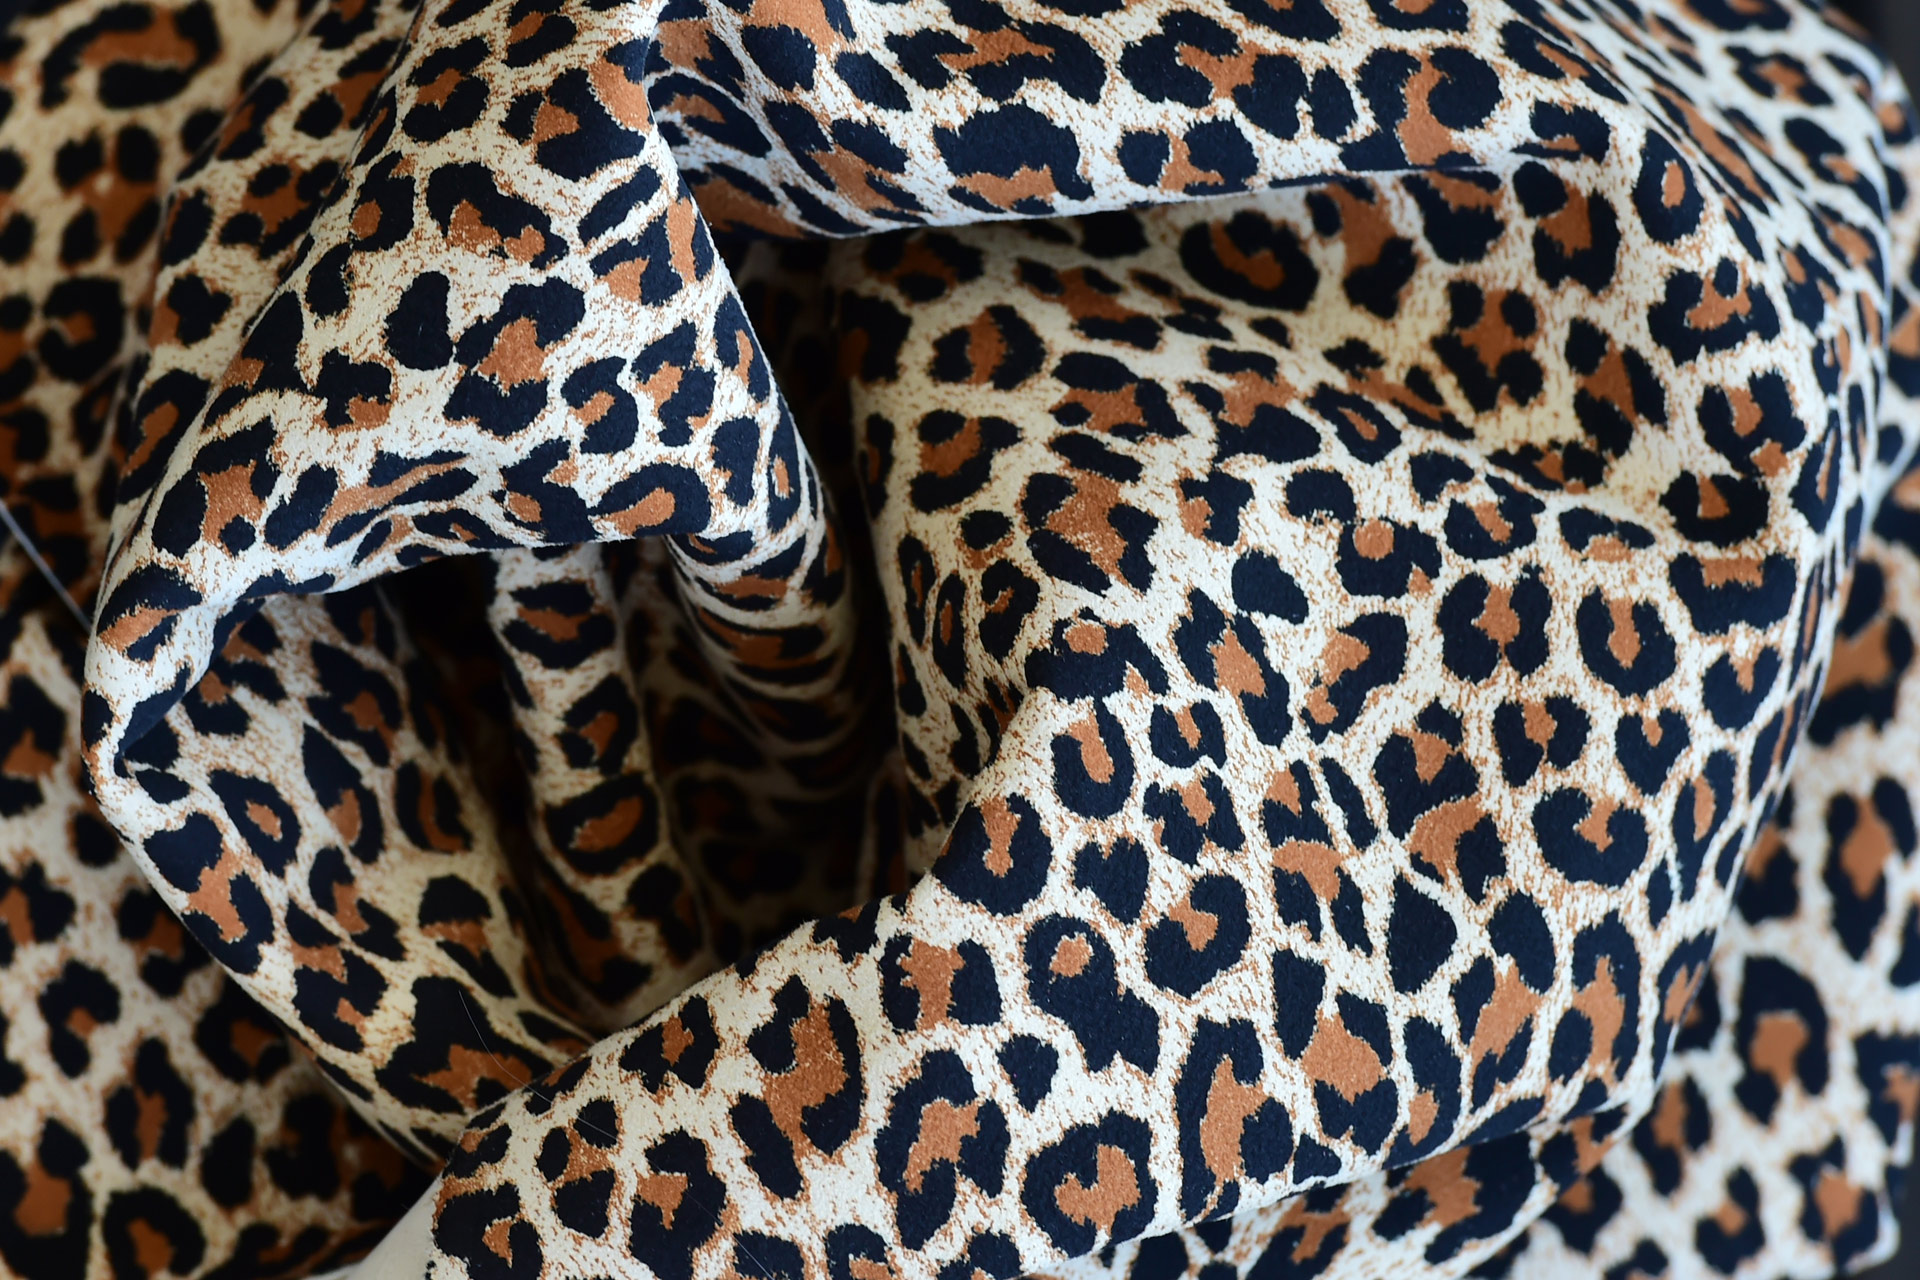 leopardino animalier AI2122 conceria stefania